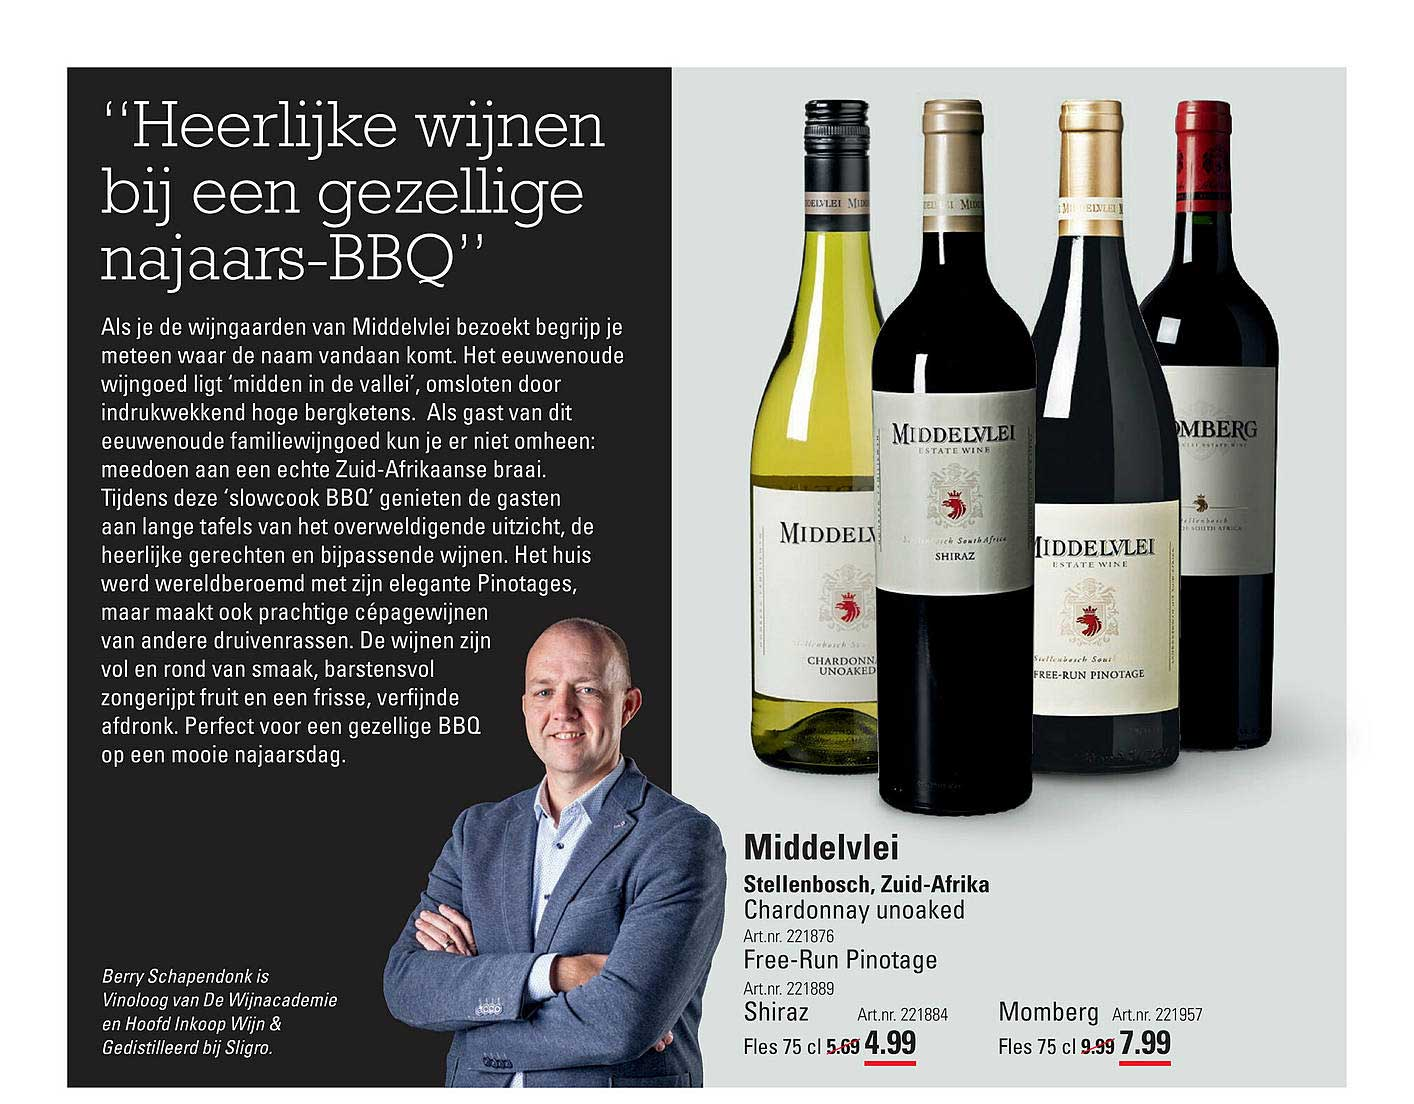 Sligro Middelvlei Chardonnay Unoaked, Free-Run Pinotage, Shiraz Of Momberg Stellenbosch, Zuid-Afrika